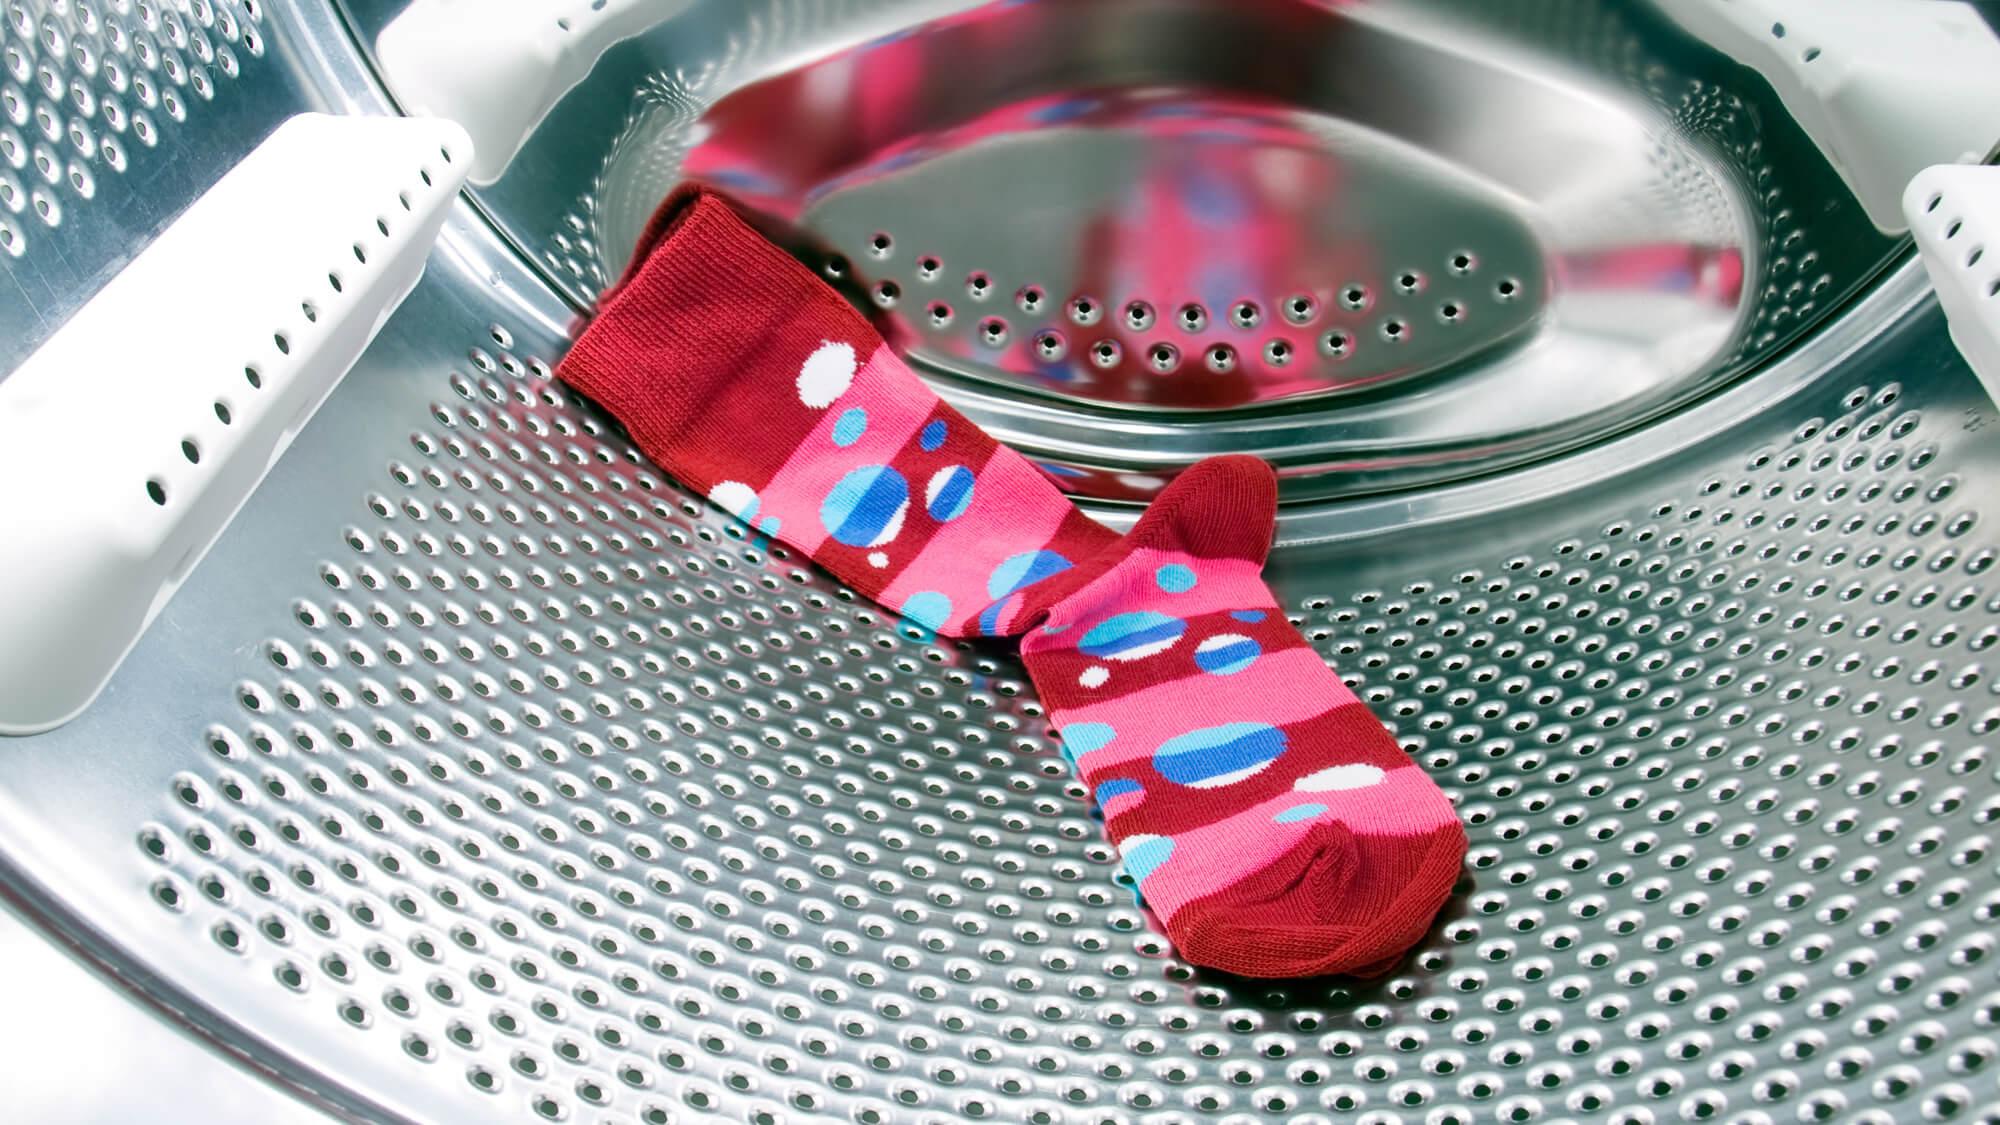 Troubleshooting | Washing machine not spinning | ao com